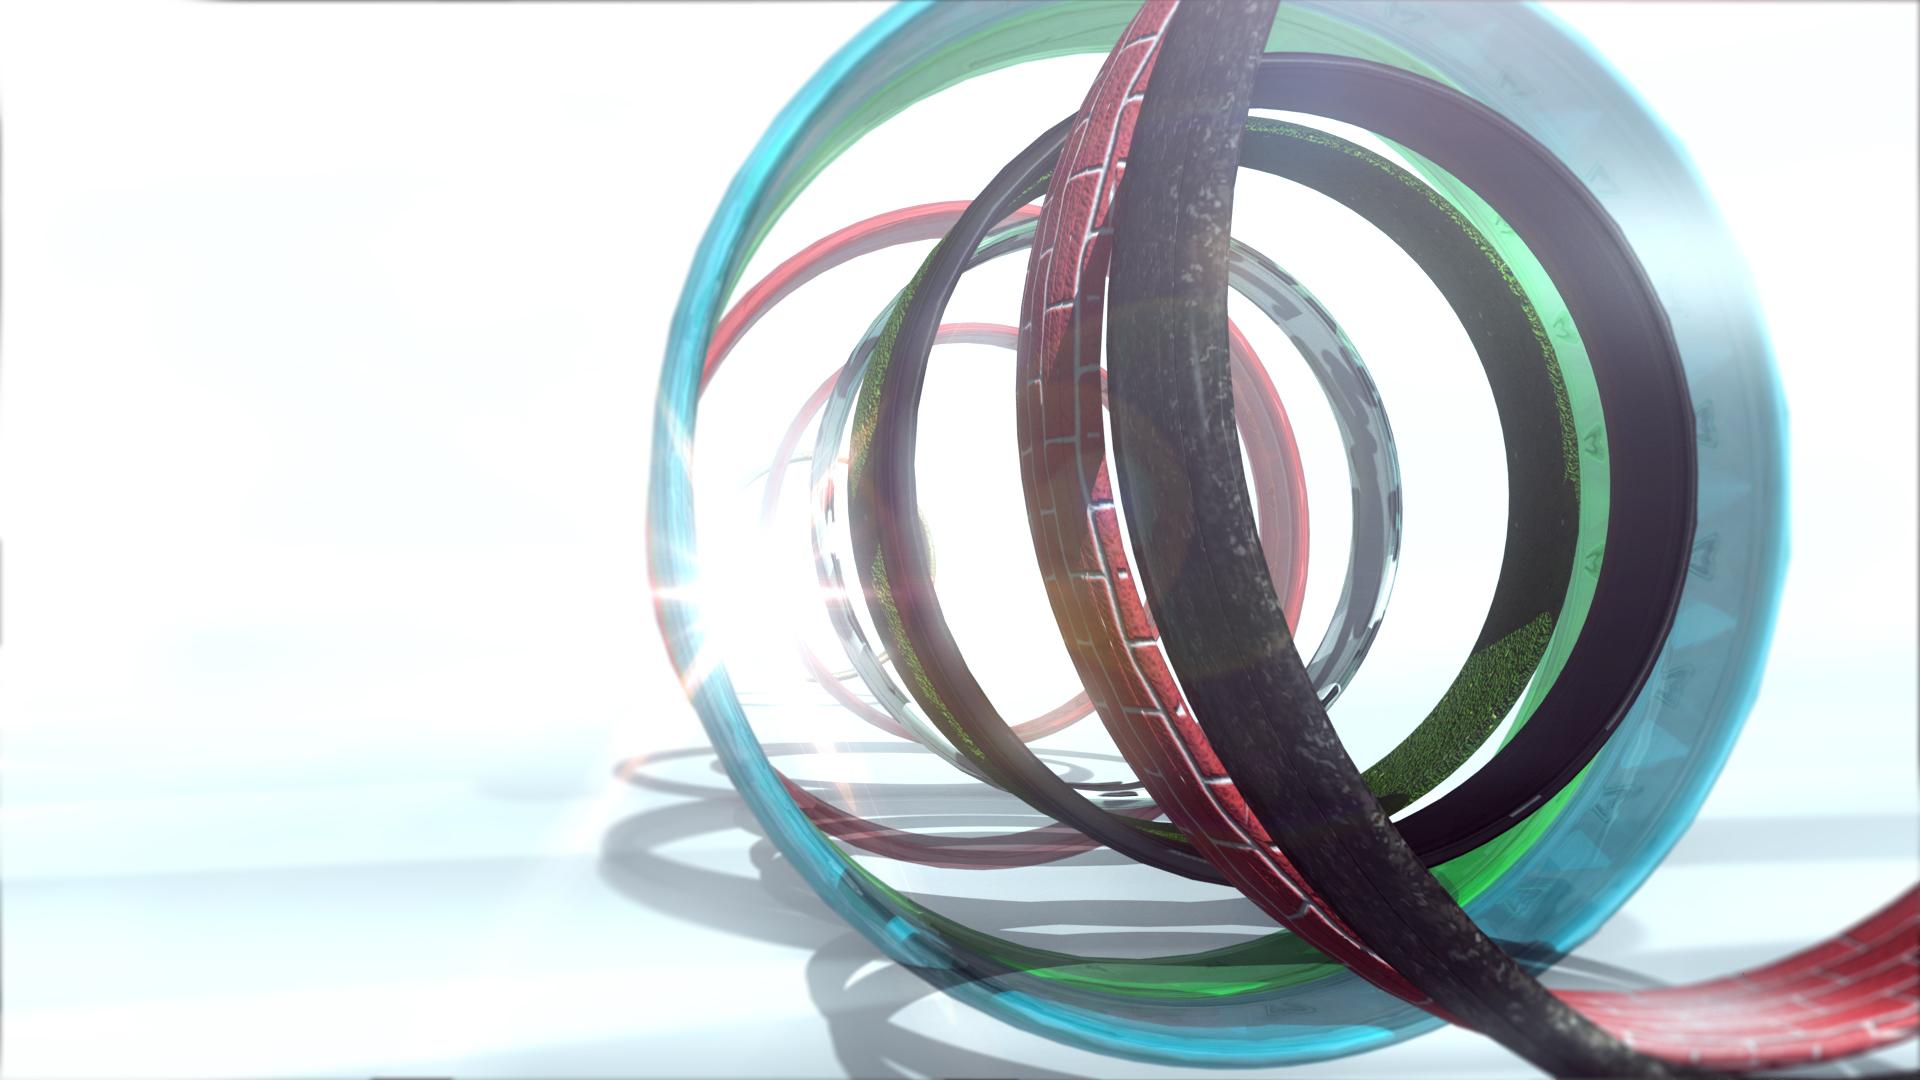 Rings by txvirus